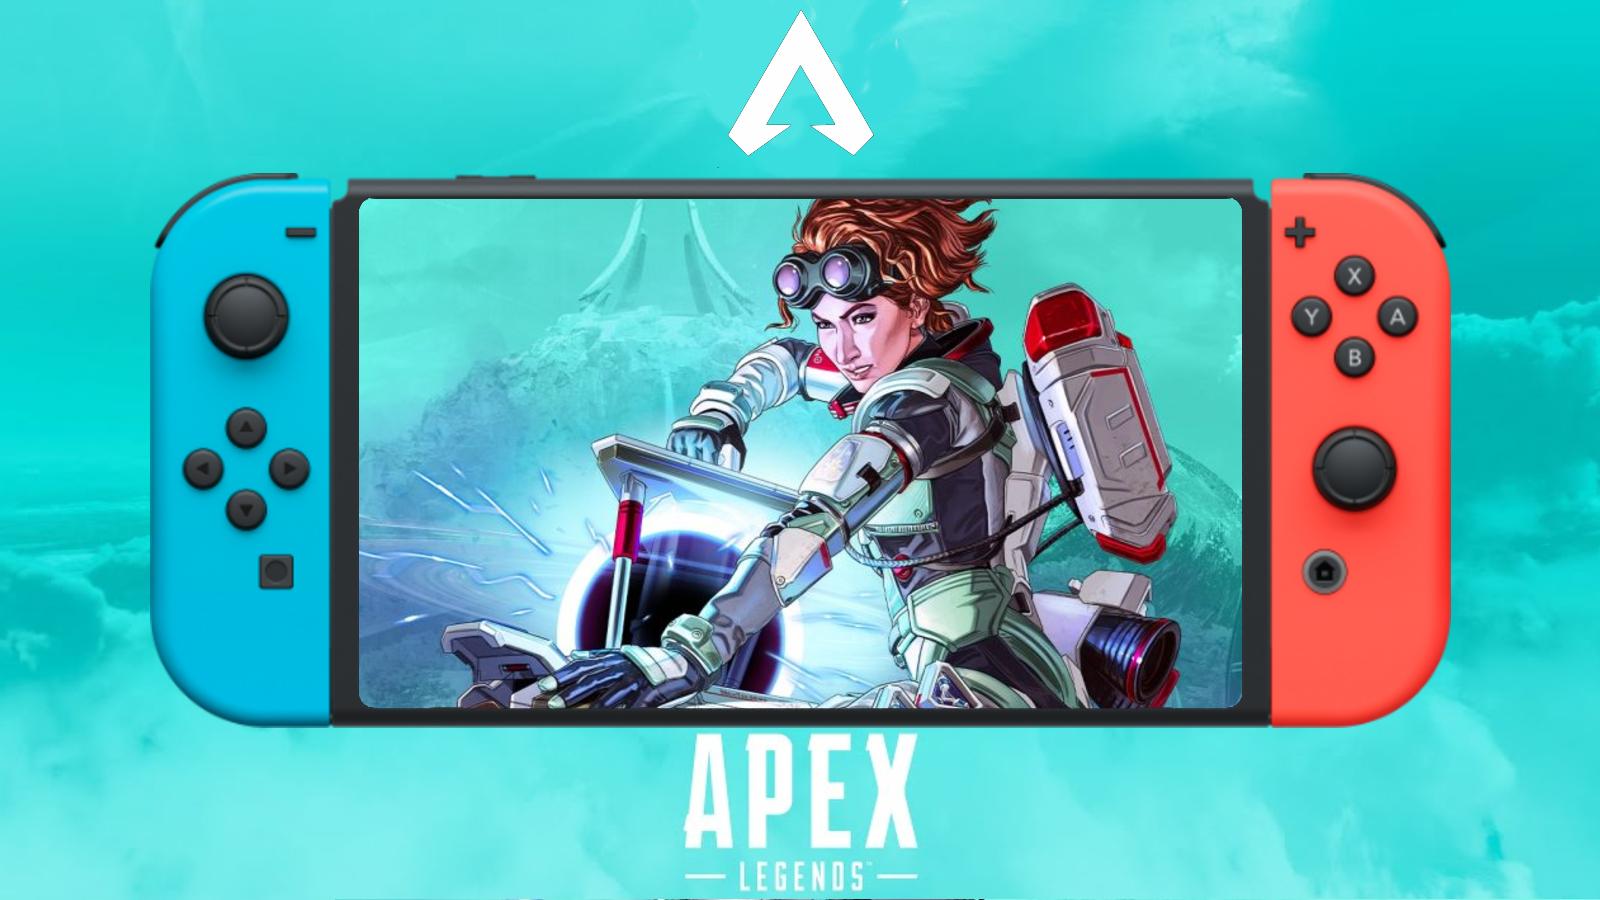 Apex Legends on Nintendo Switch